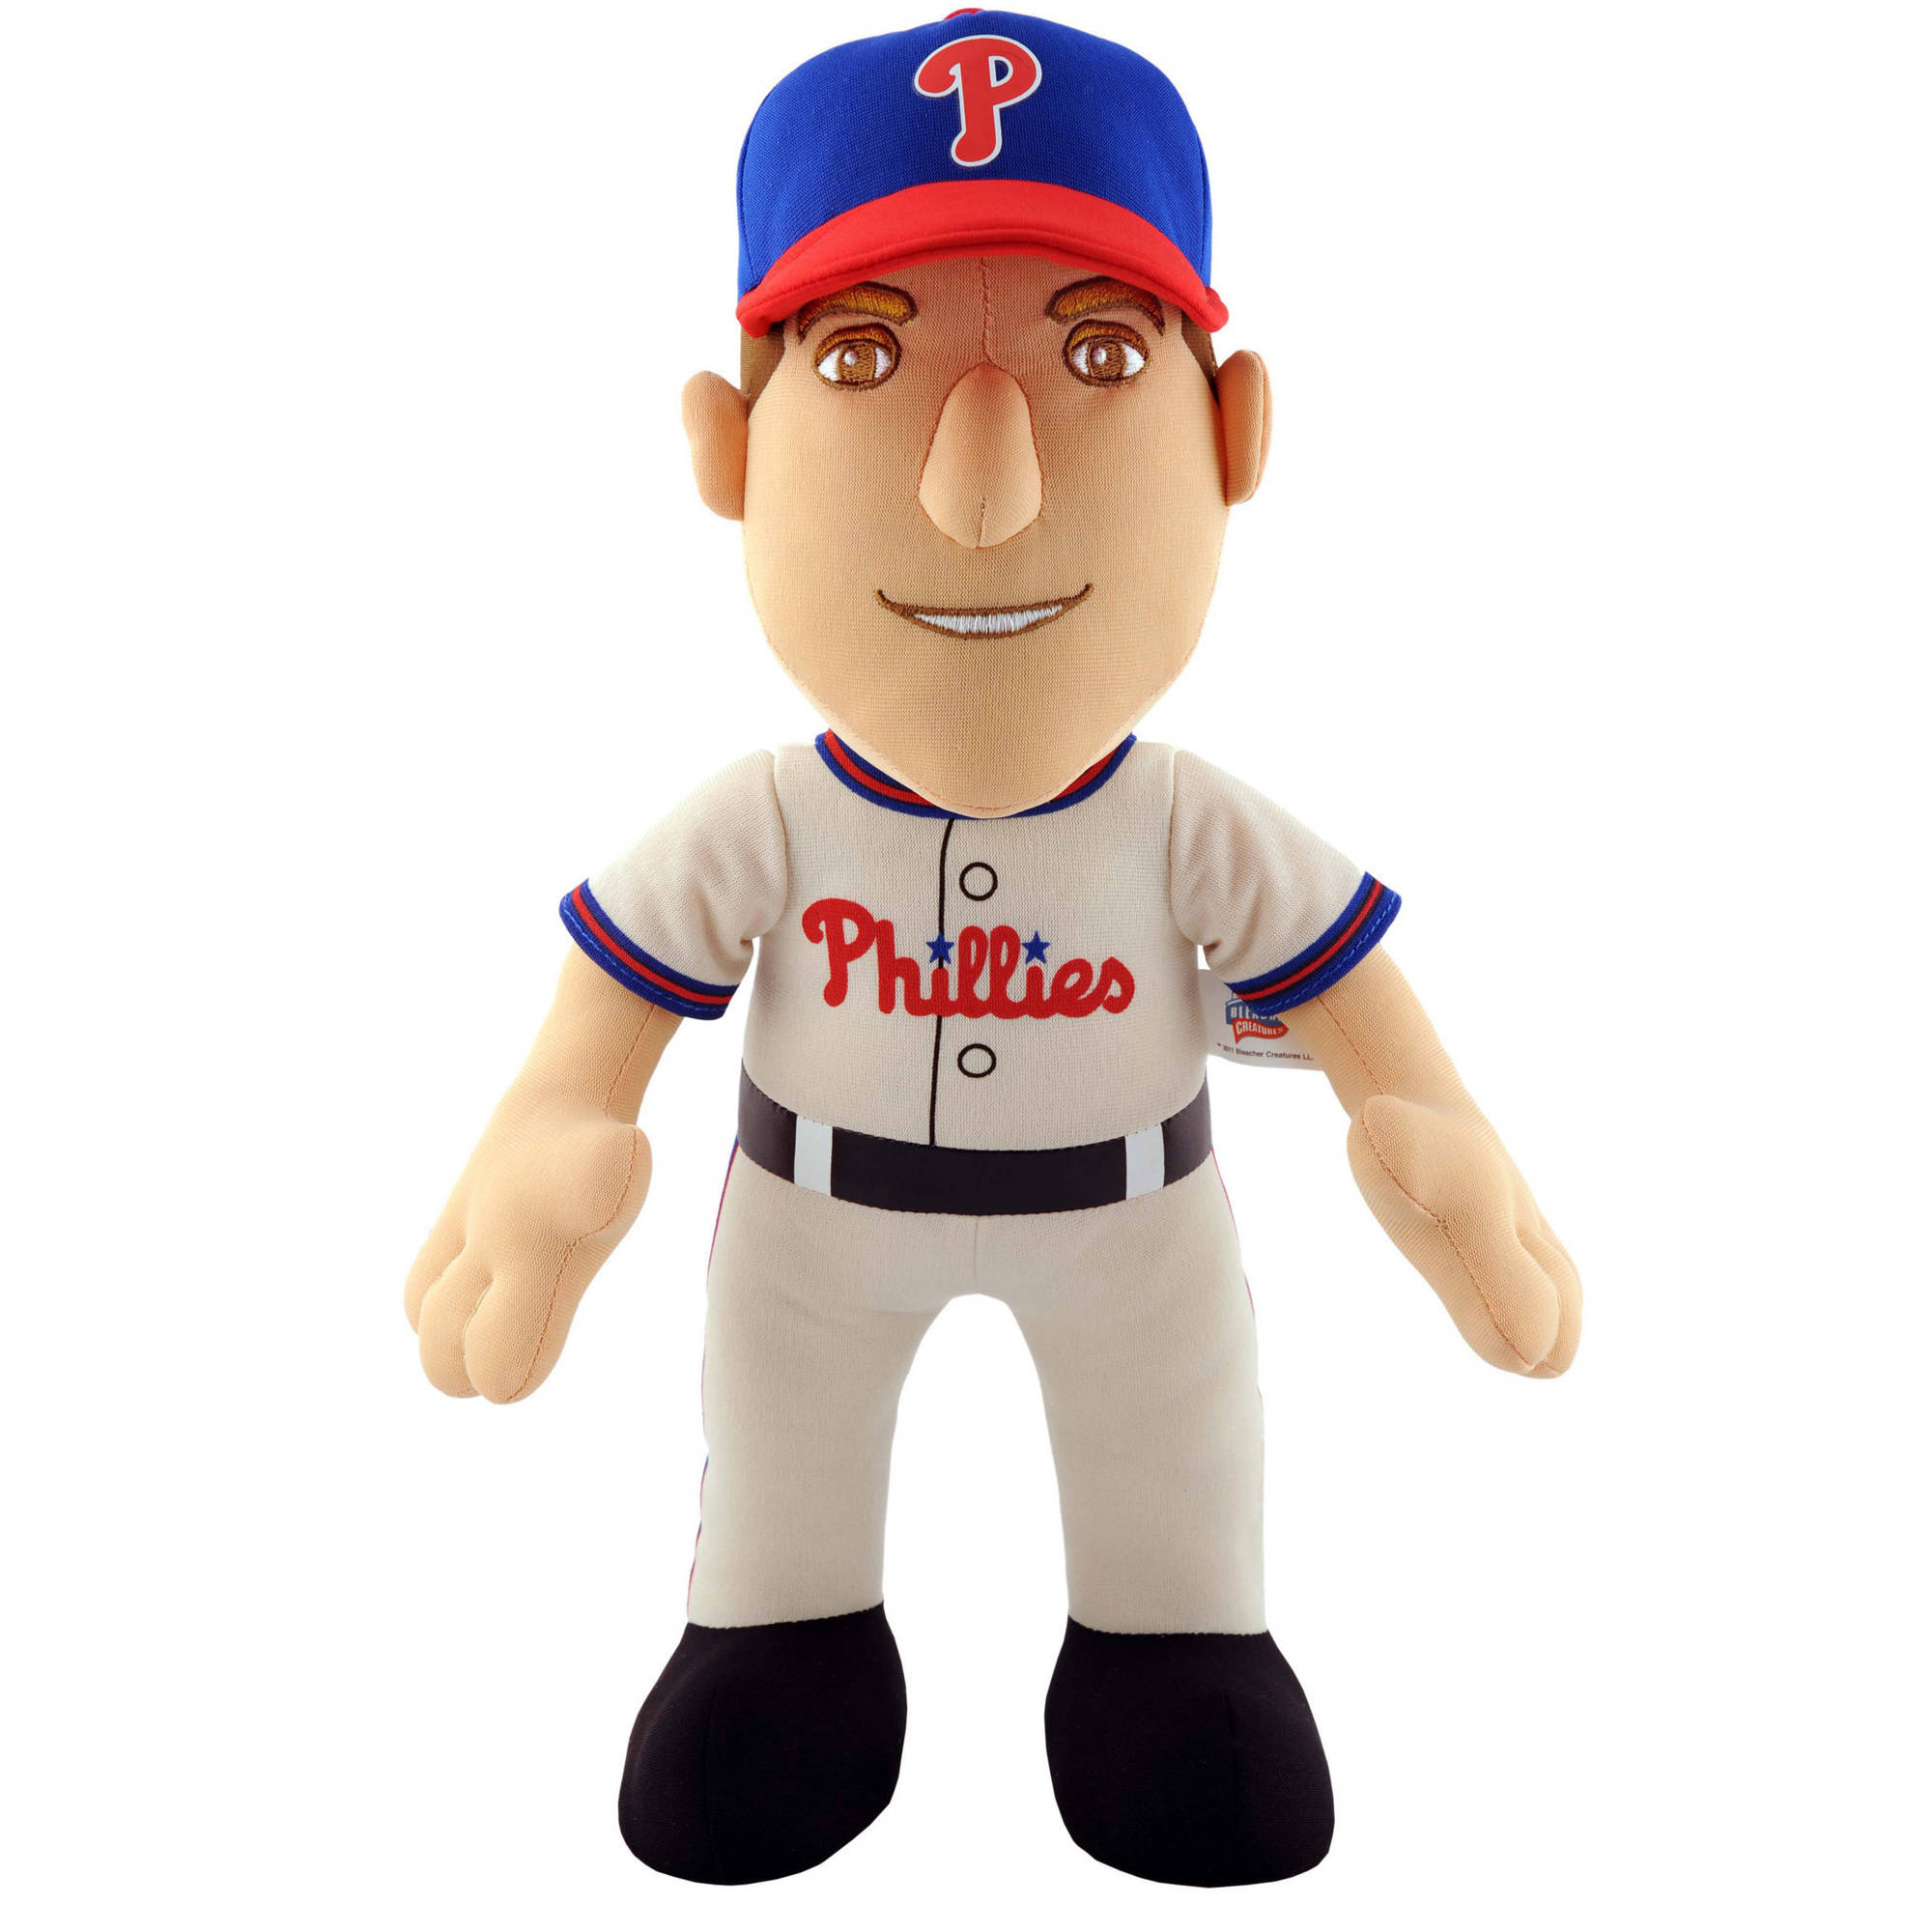 "Bleacher Creatures MLB 14"" Plush Doll, Roy Halladay, Philadelphia Phillies"